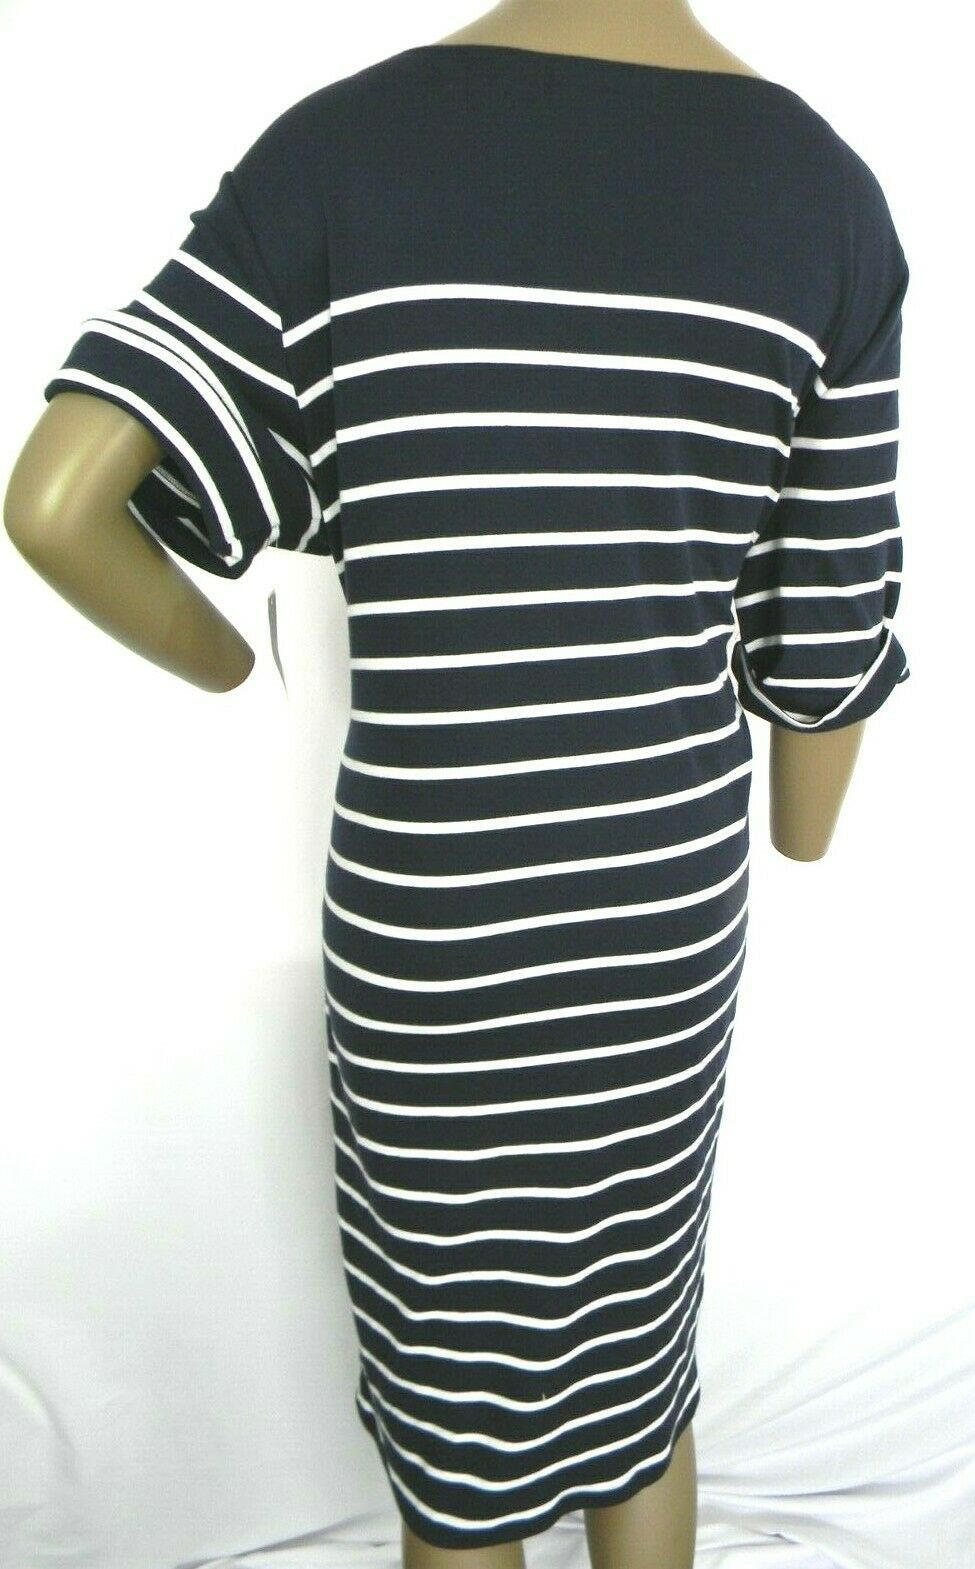 Karen Scott Plus Size 2X,3X Dress Floral Embroidered Striped Shift Dress NEW $54 image 9